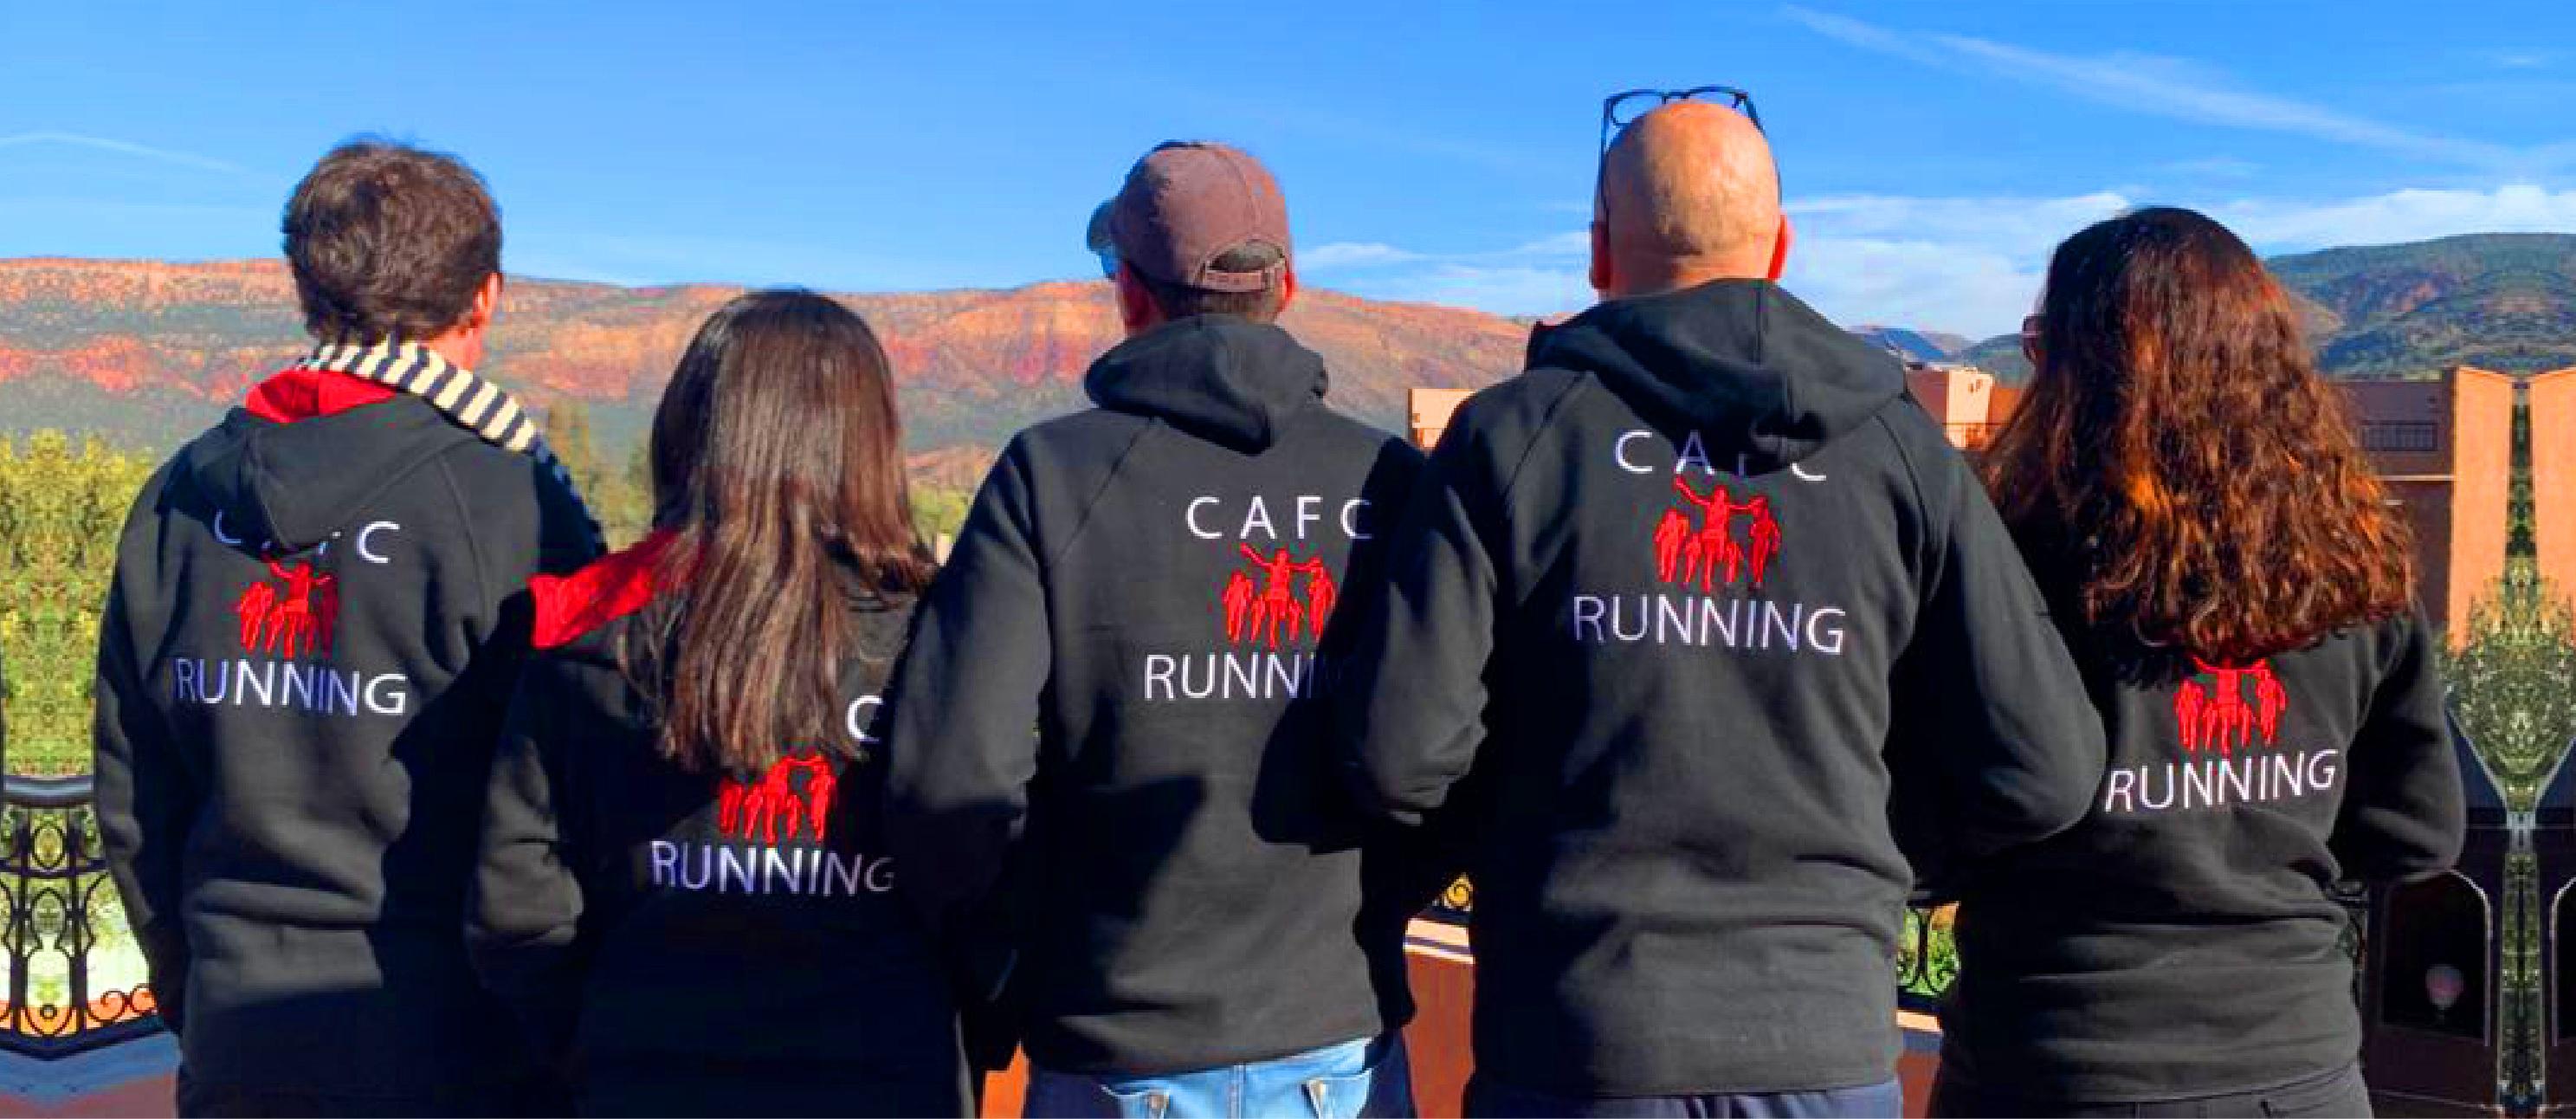 CAFC RUNNING